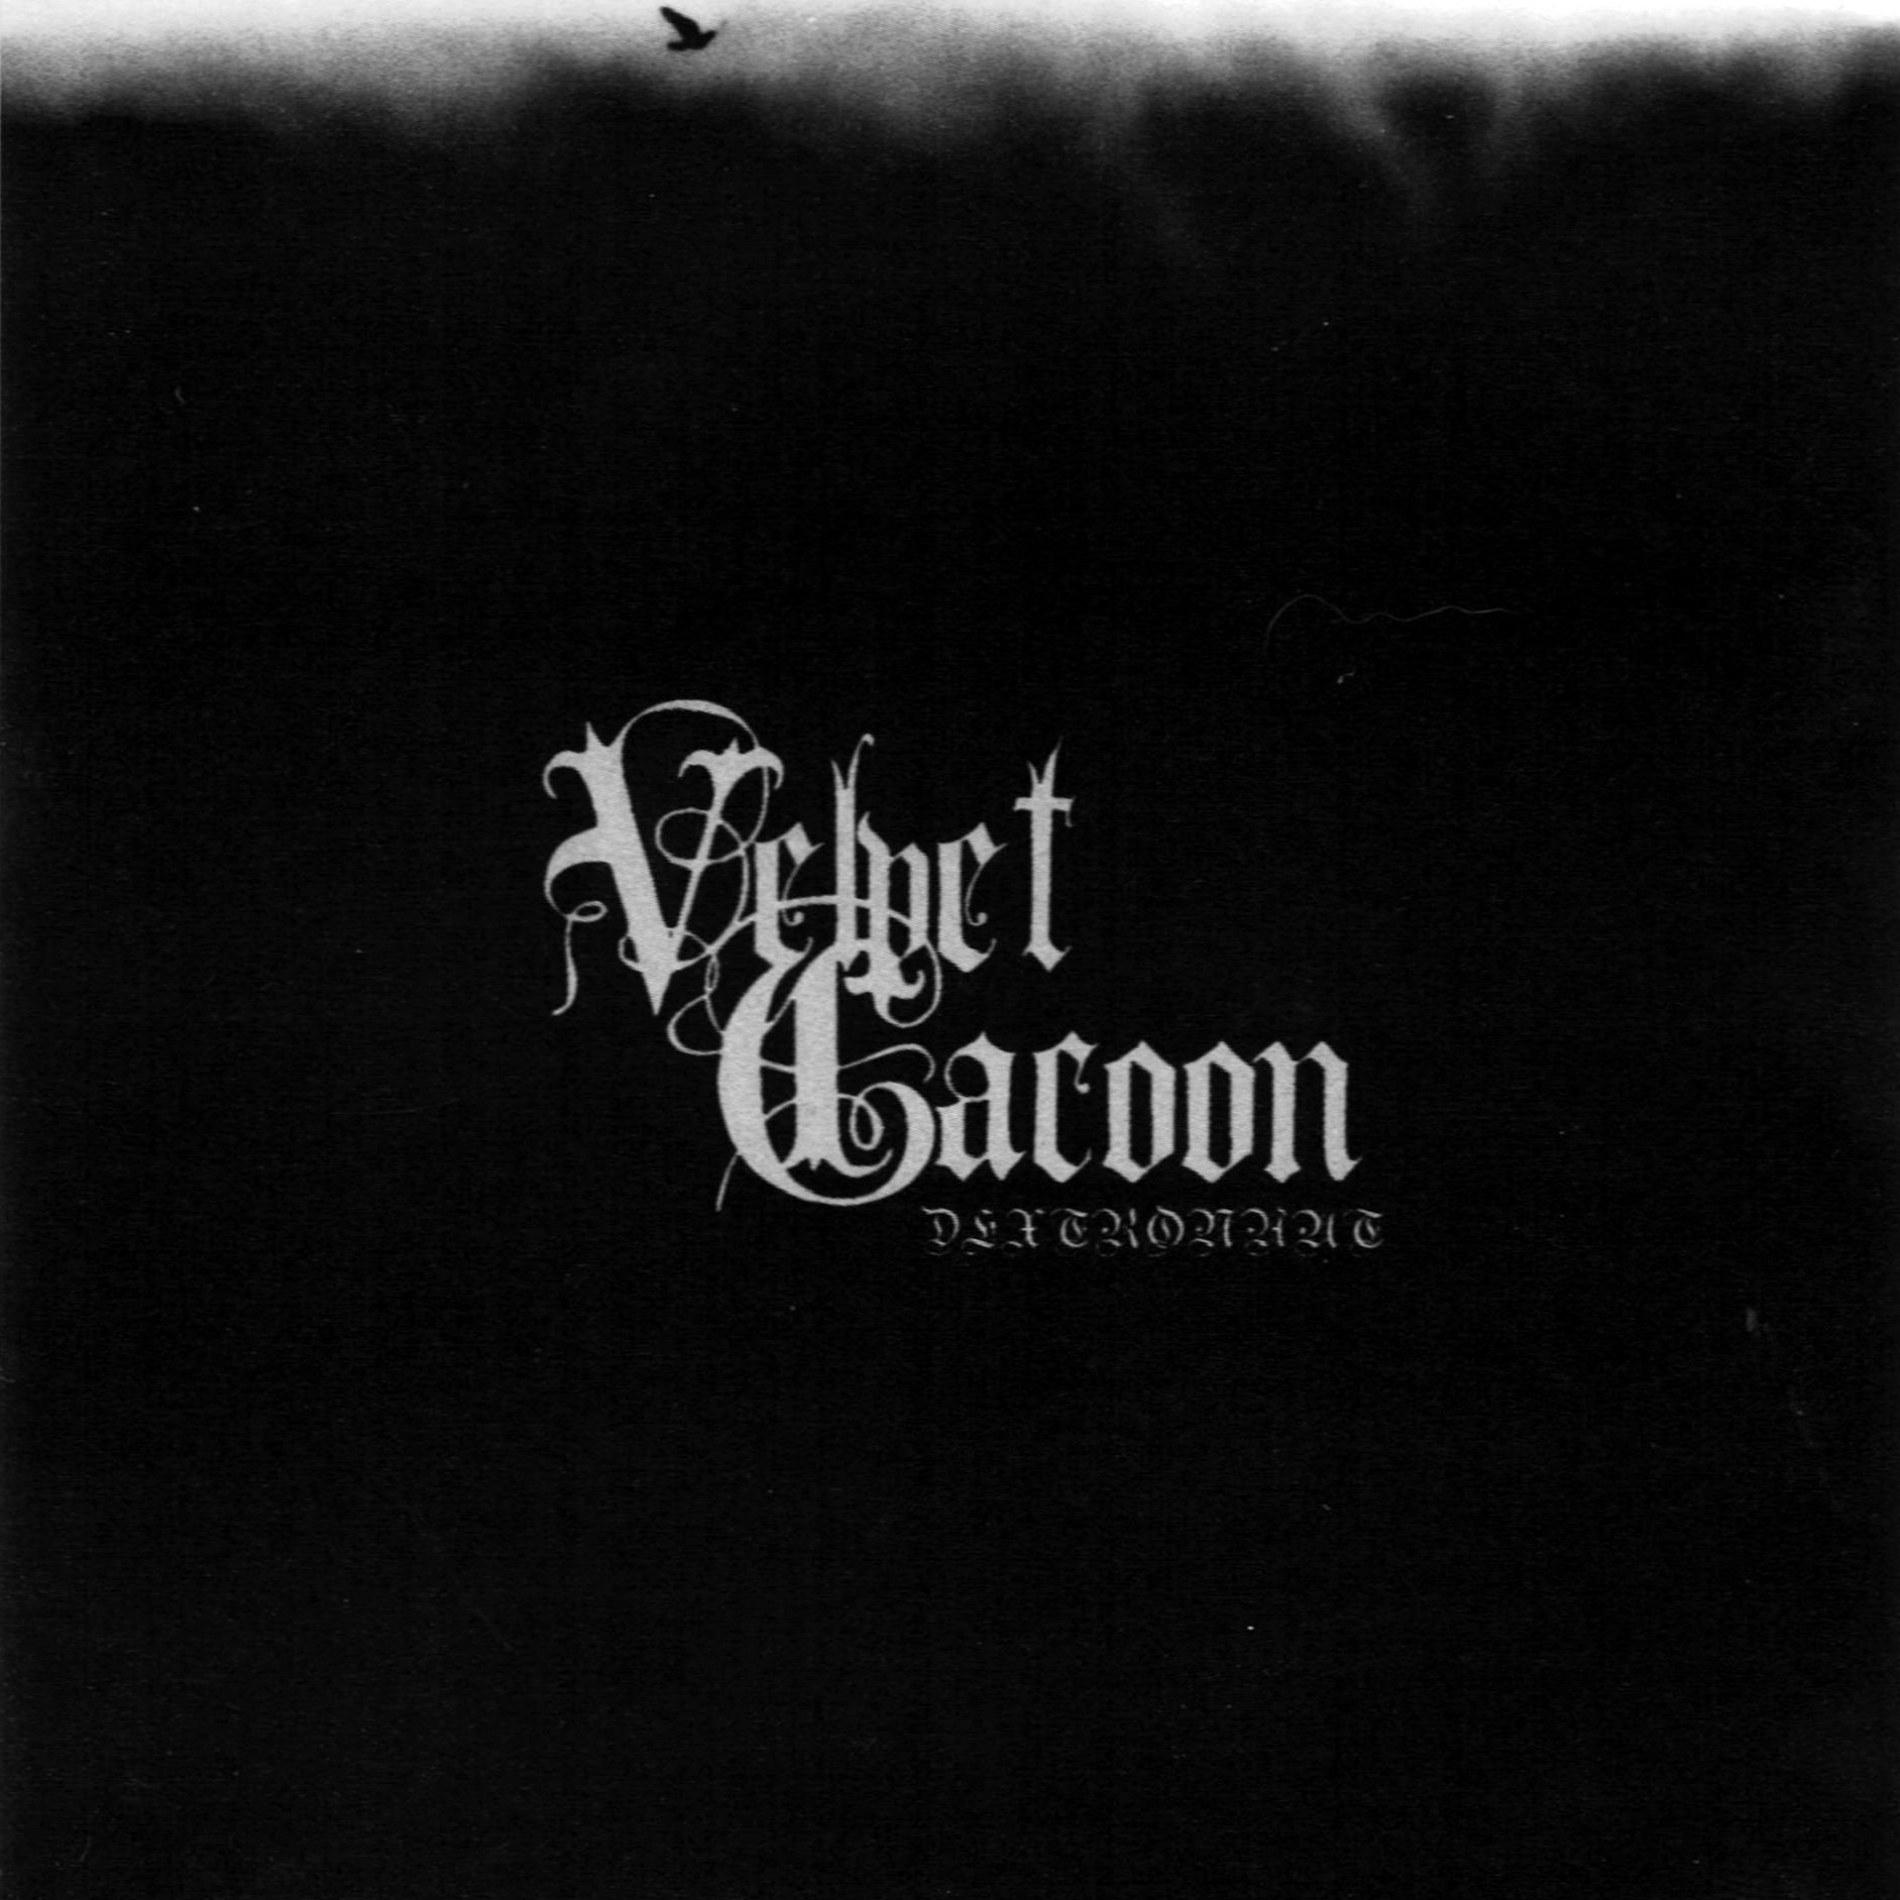 Review for Velvet Cacoon - Dextronaut